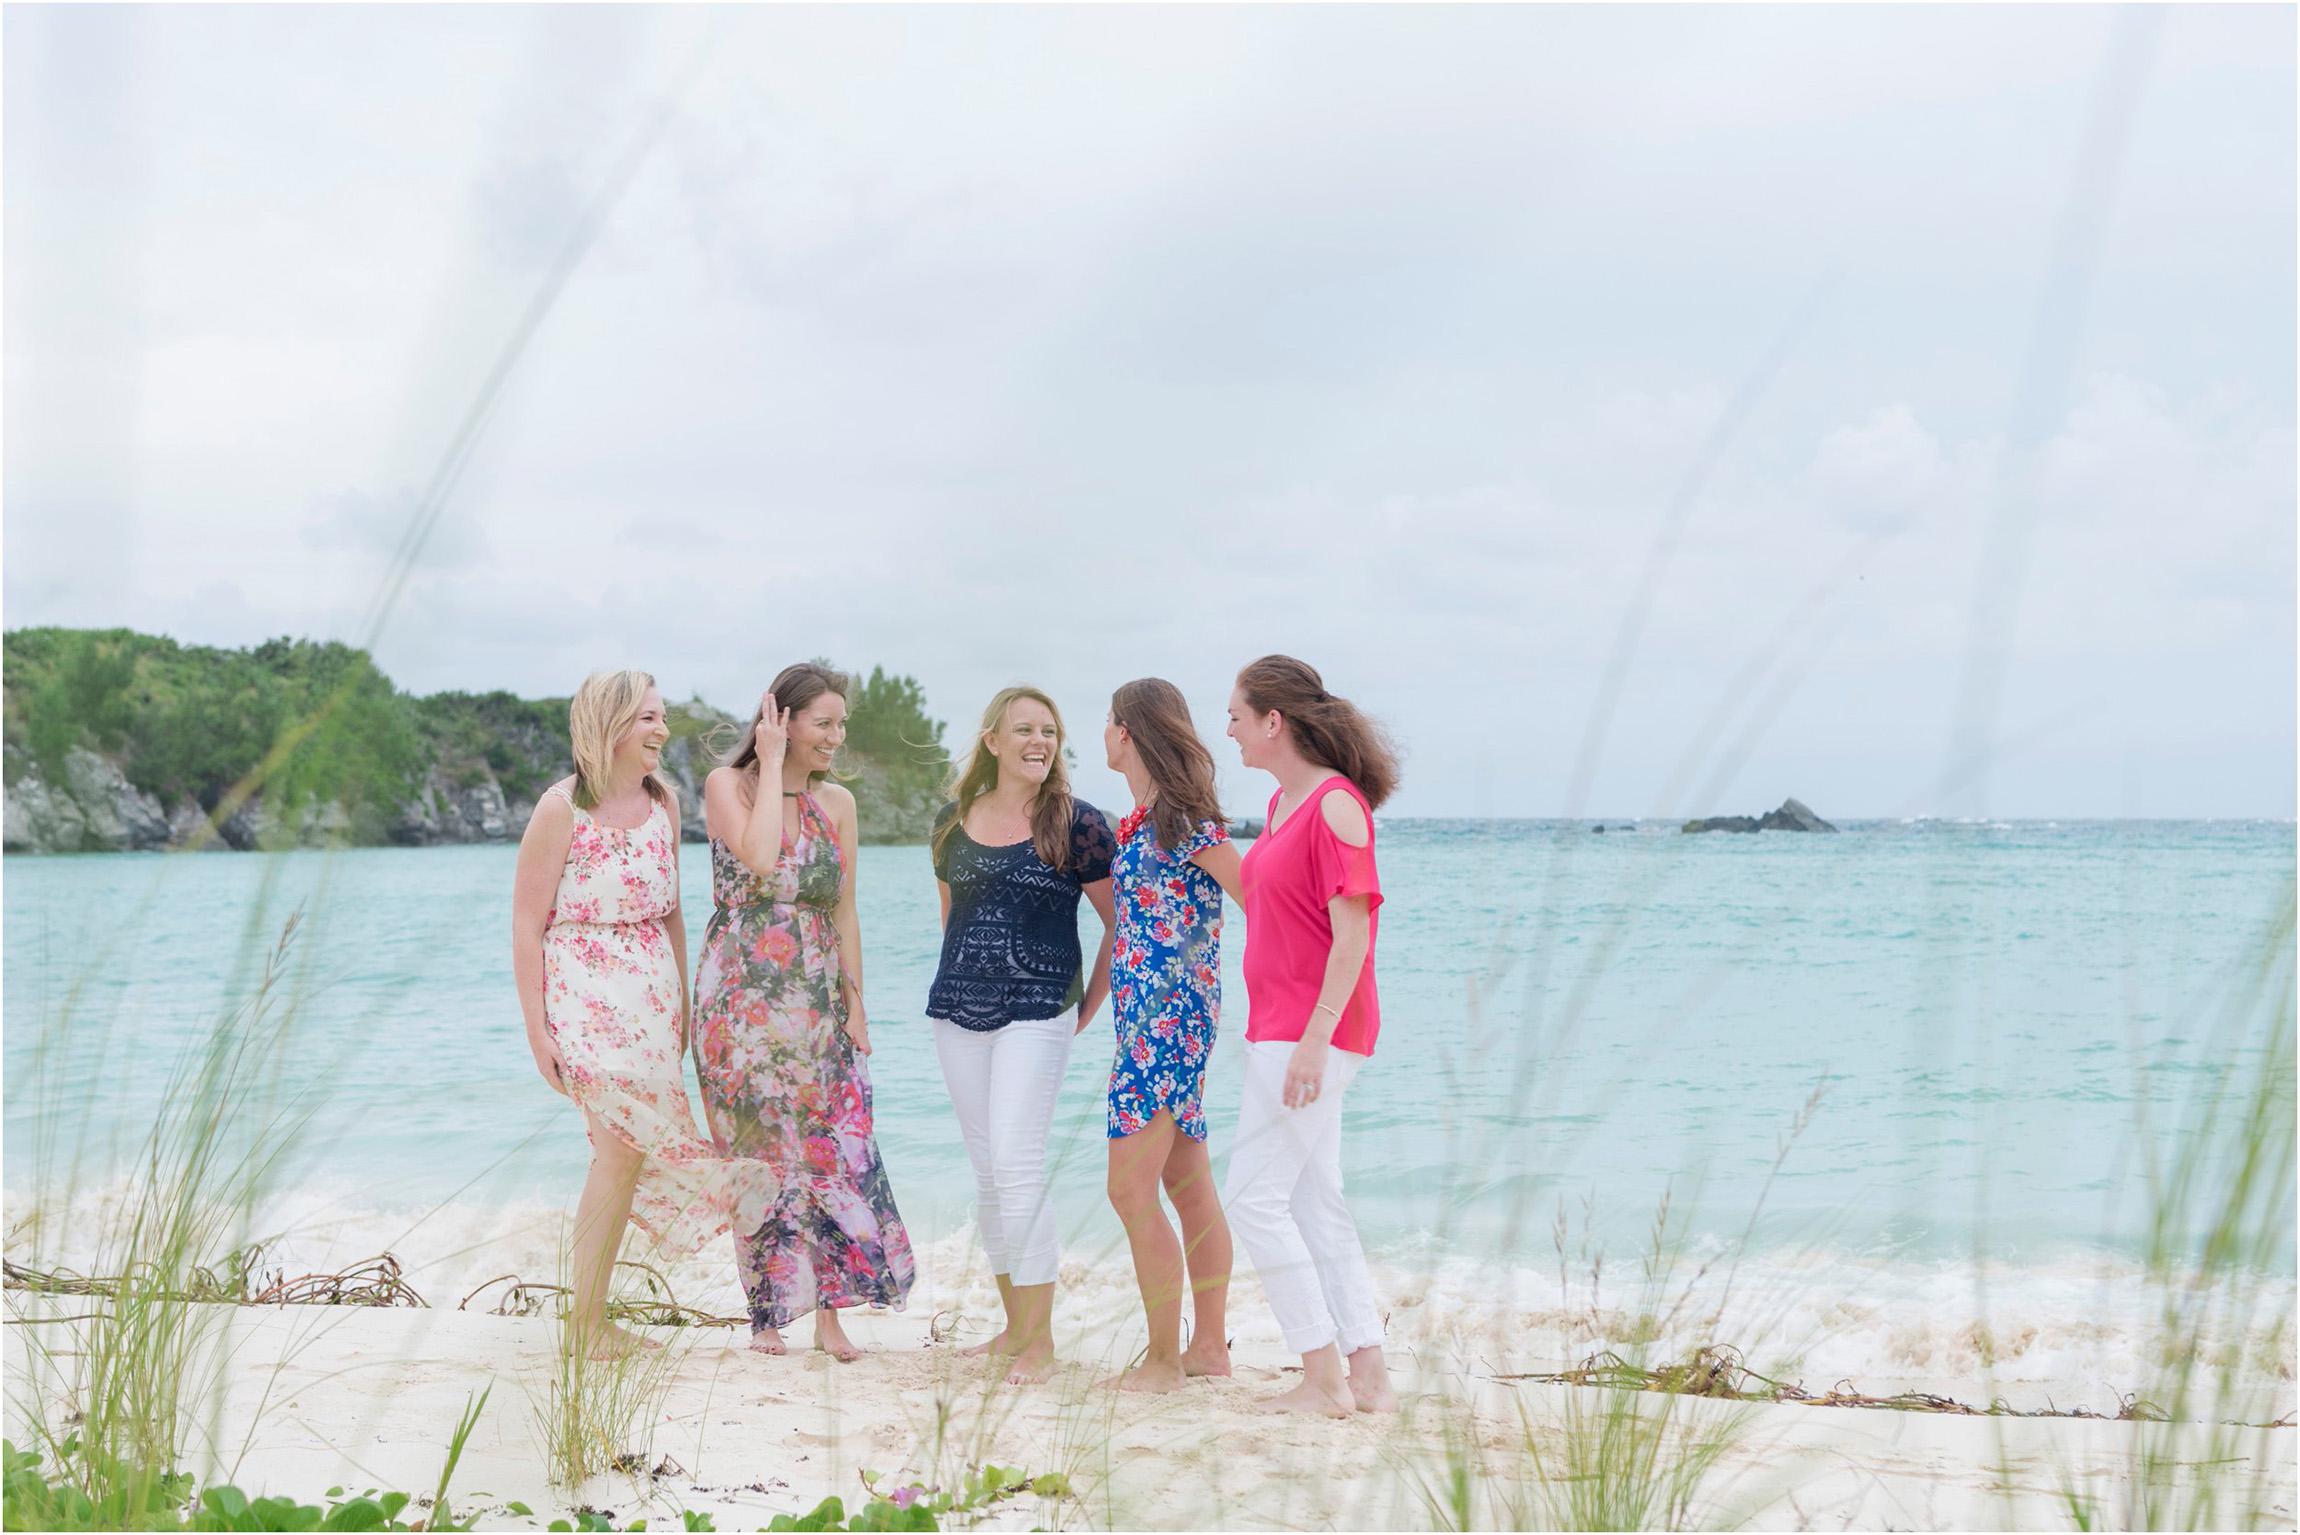 ©FianderFoto_Bermuda Photographer_bachelorette_003.jpg